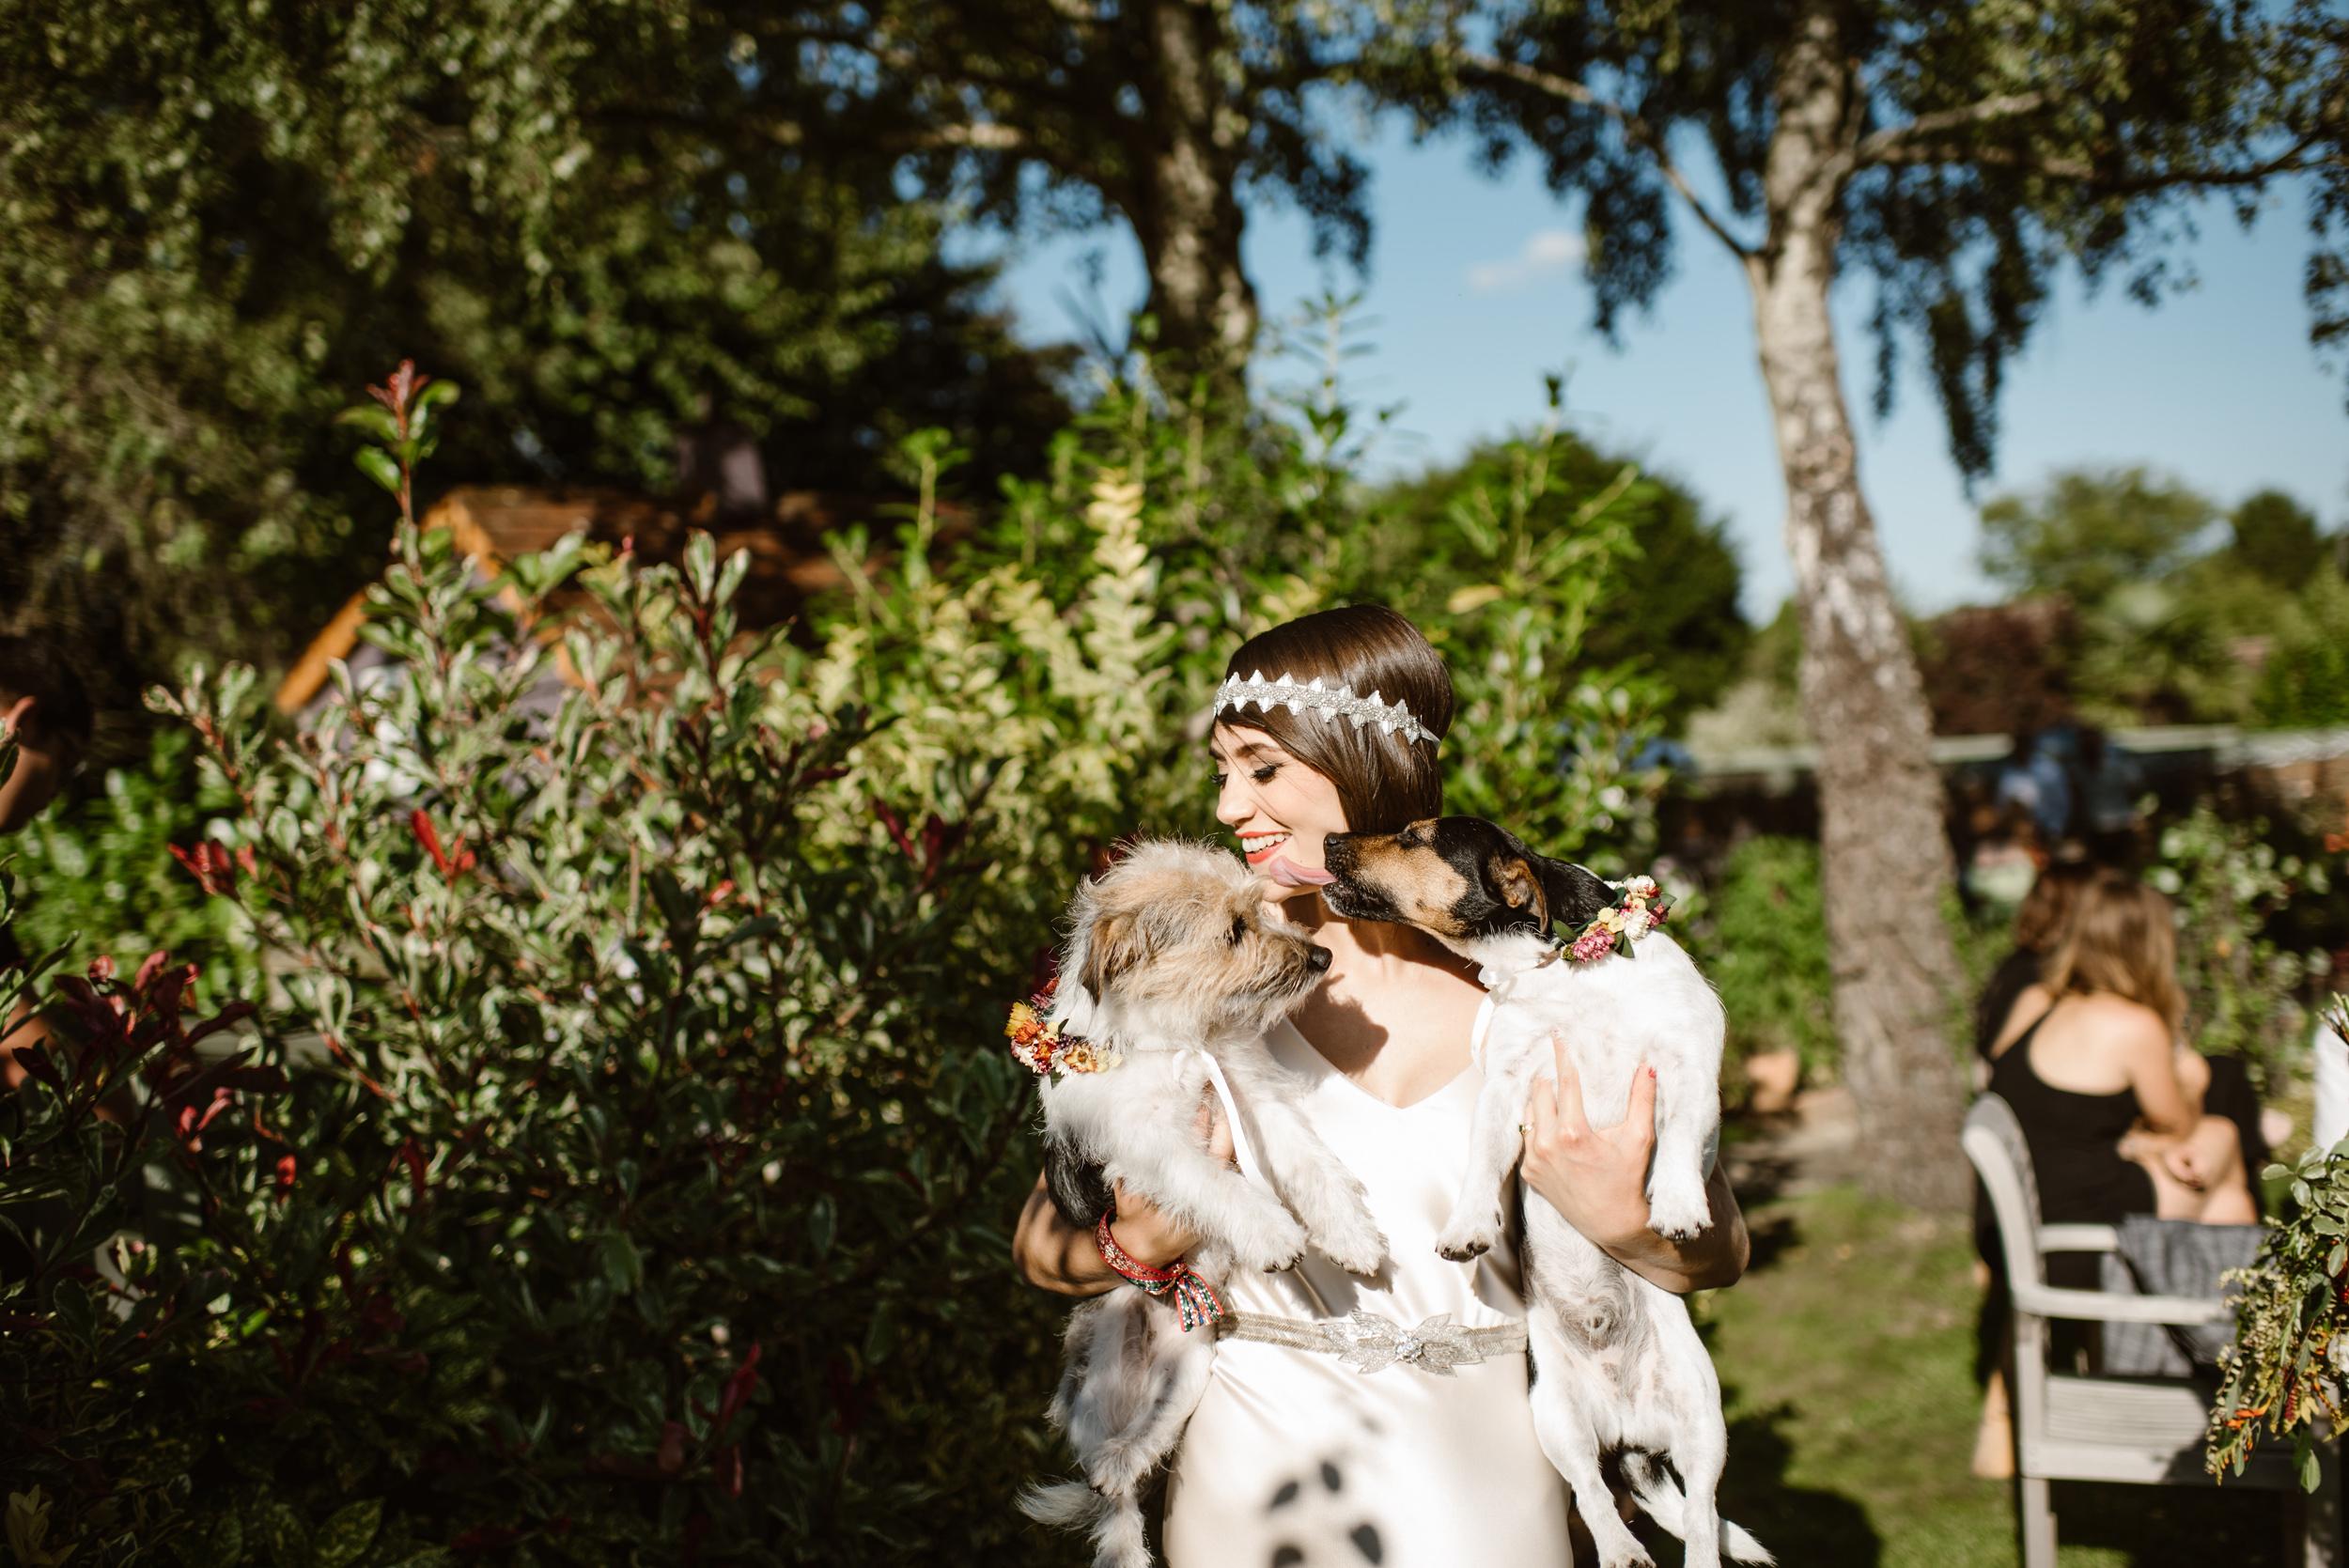 Ro-Kate-Beaumont-bias-cut-silk-wedding-gown-back-garden-wedding-by-Ellie-Gillard-36.jpg